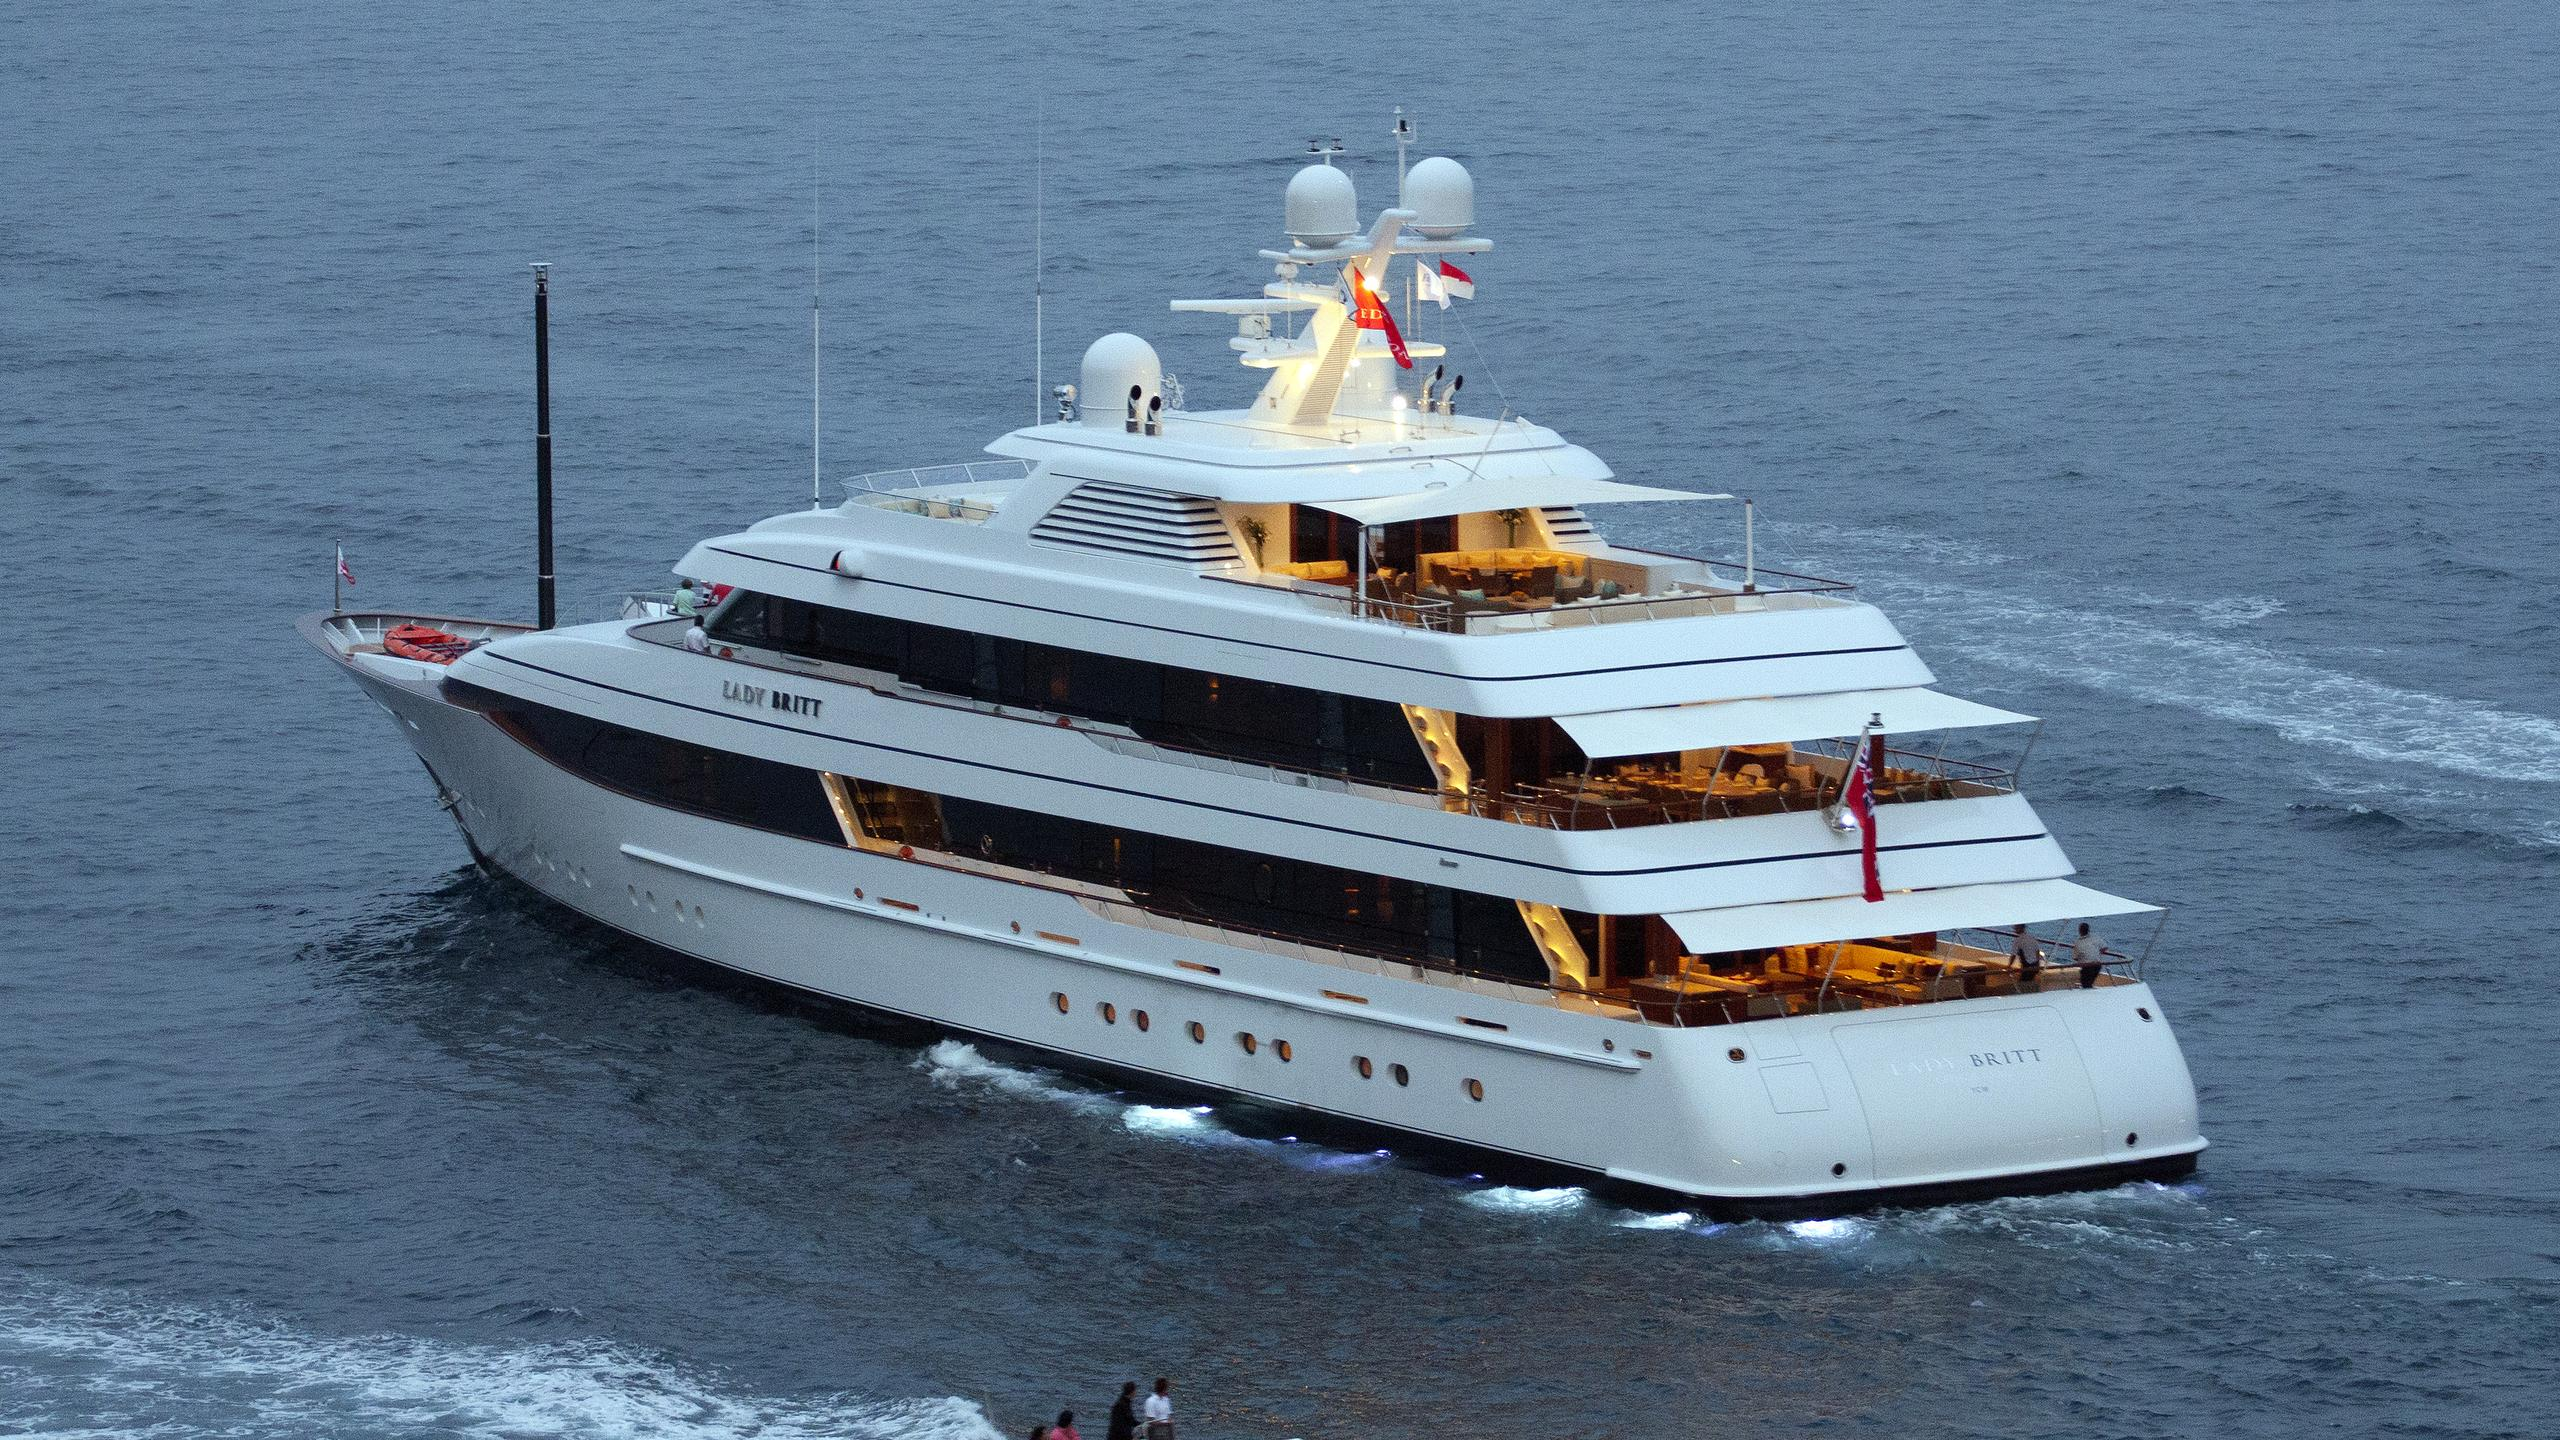 lady-britt-yacht-exterior